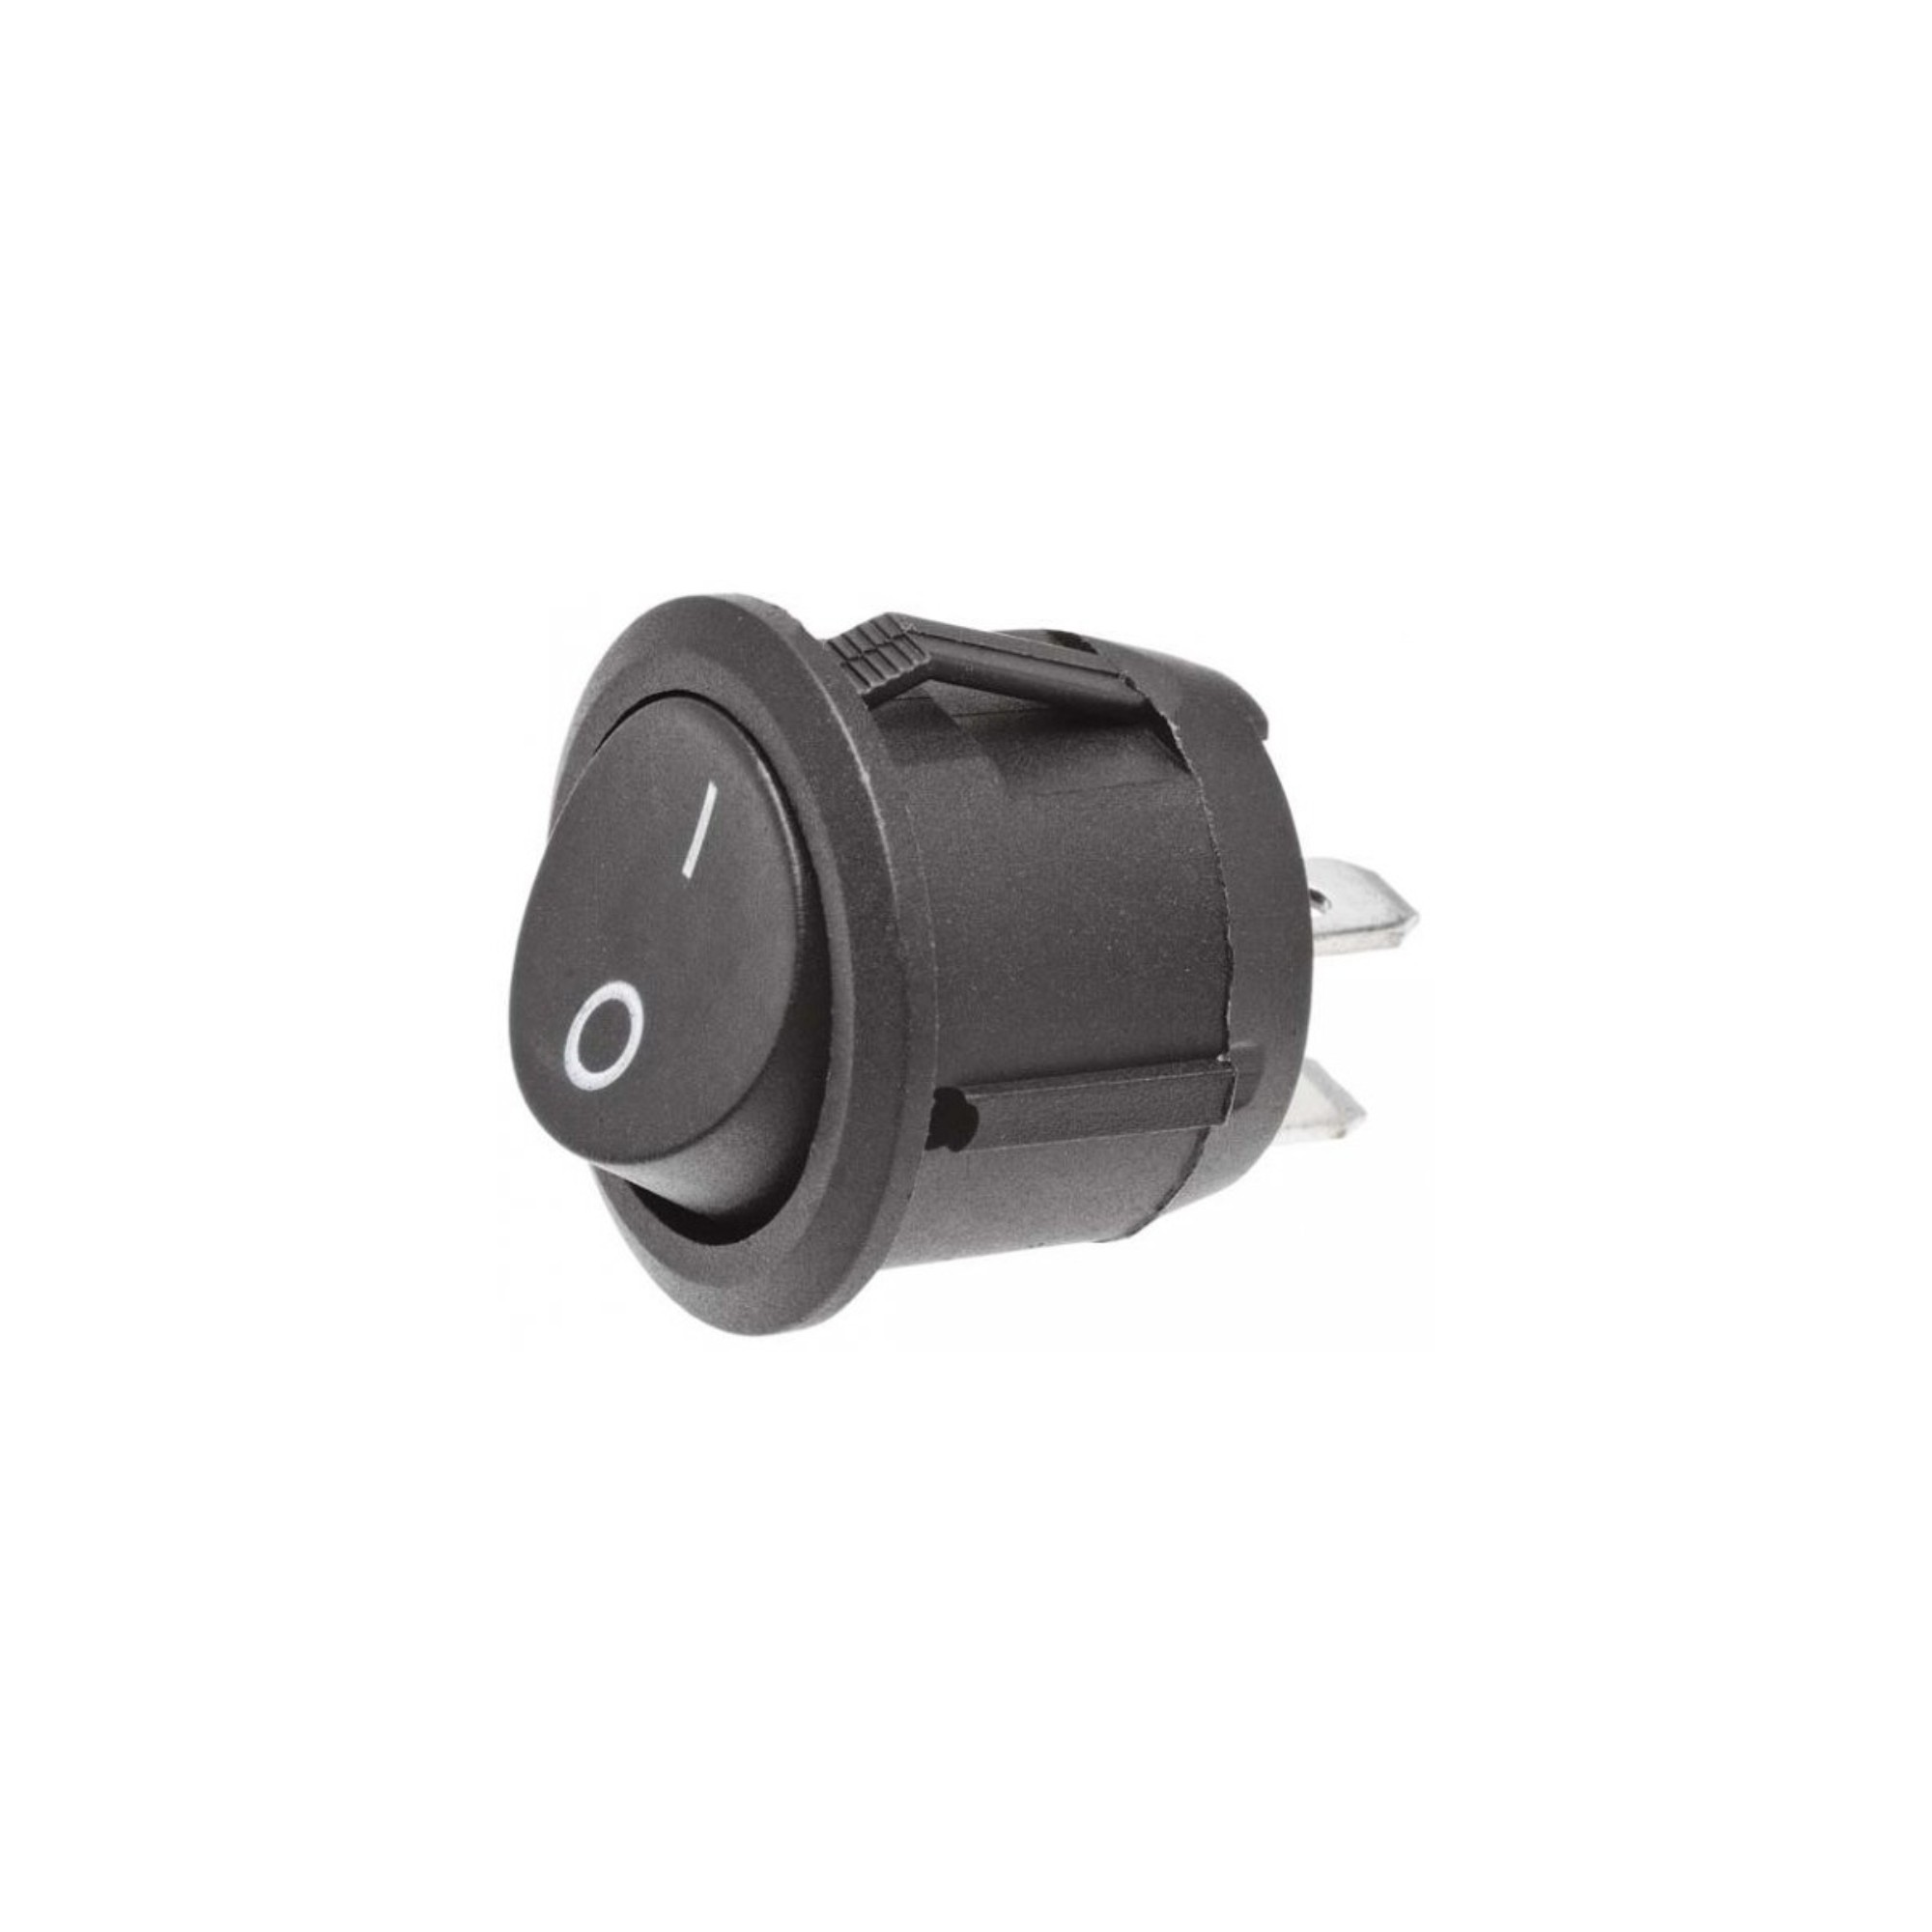 Botão Chave Gangorra Mini Interruptor Liga Desliga On Off